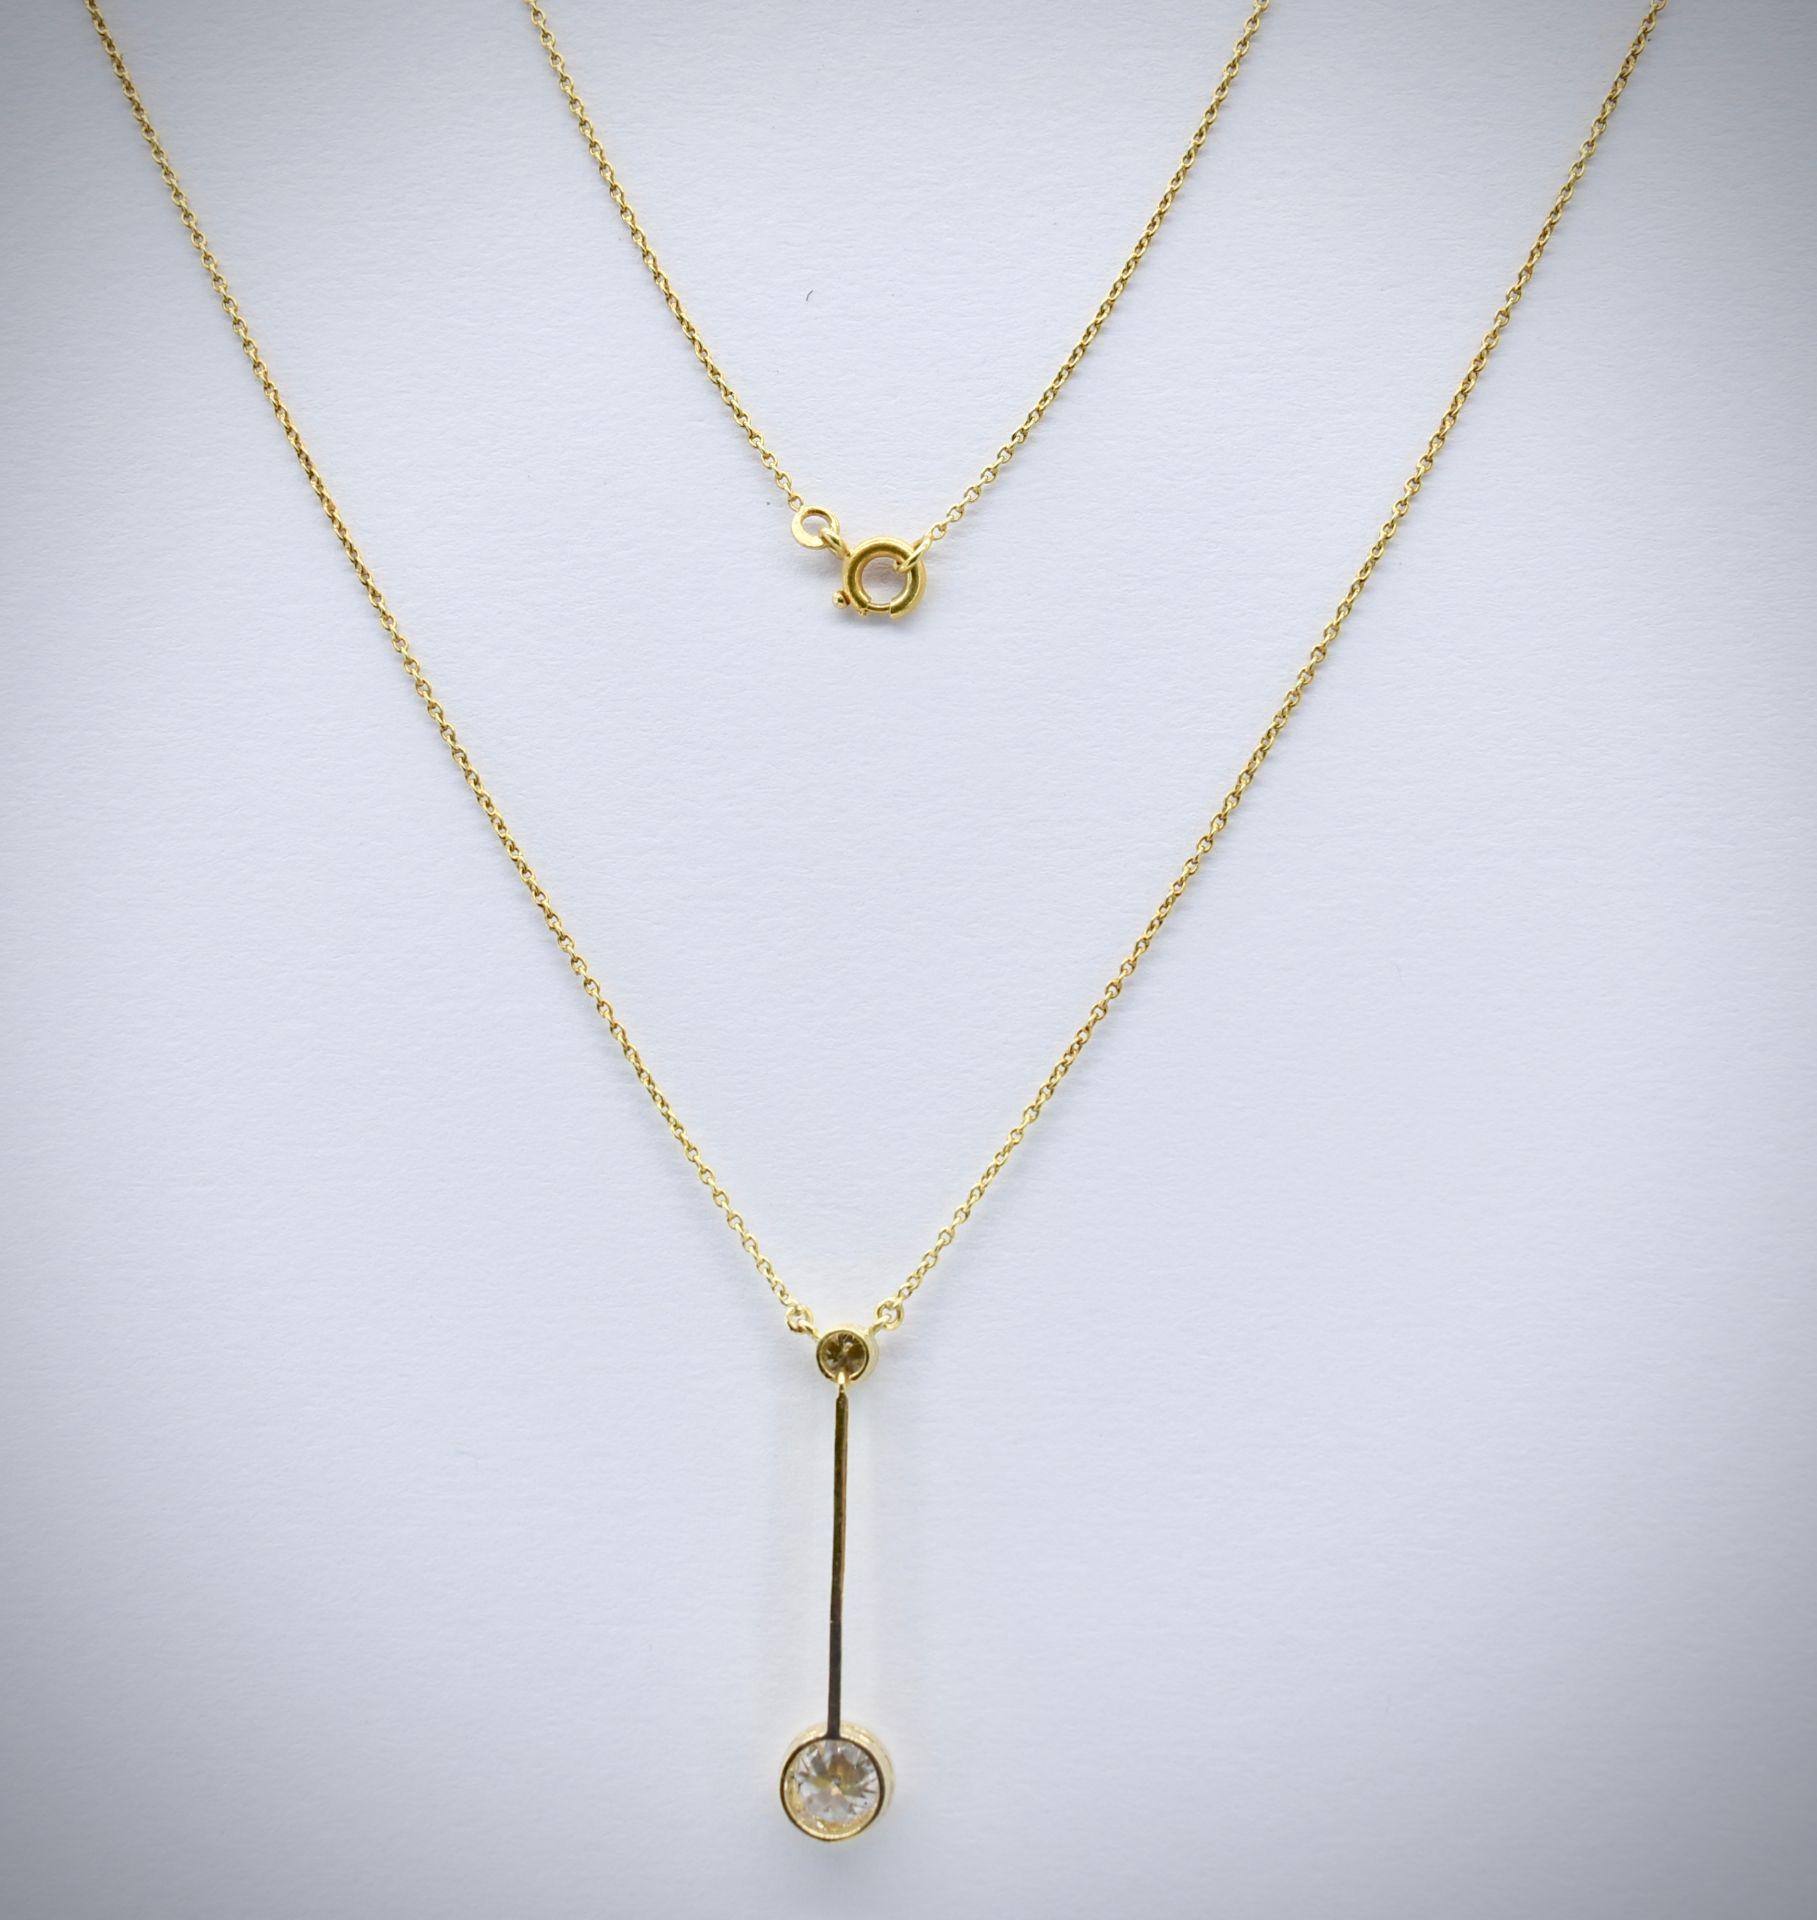 14ct Gold & Diamond Pendant Necklace - Image 2 of 5